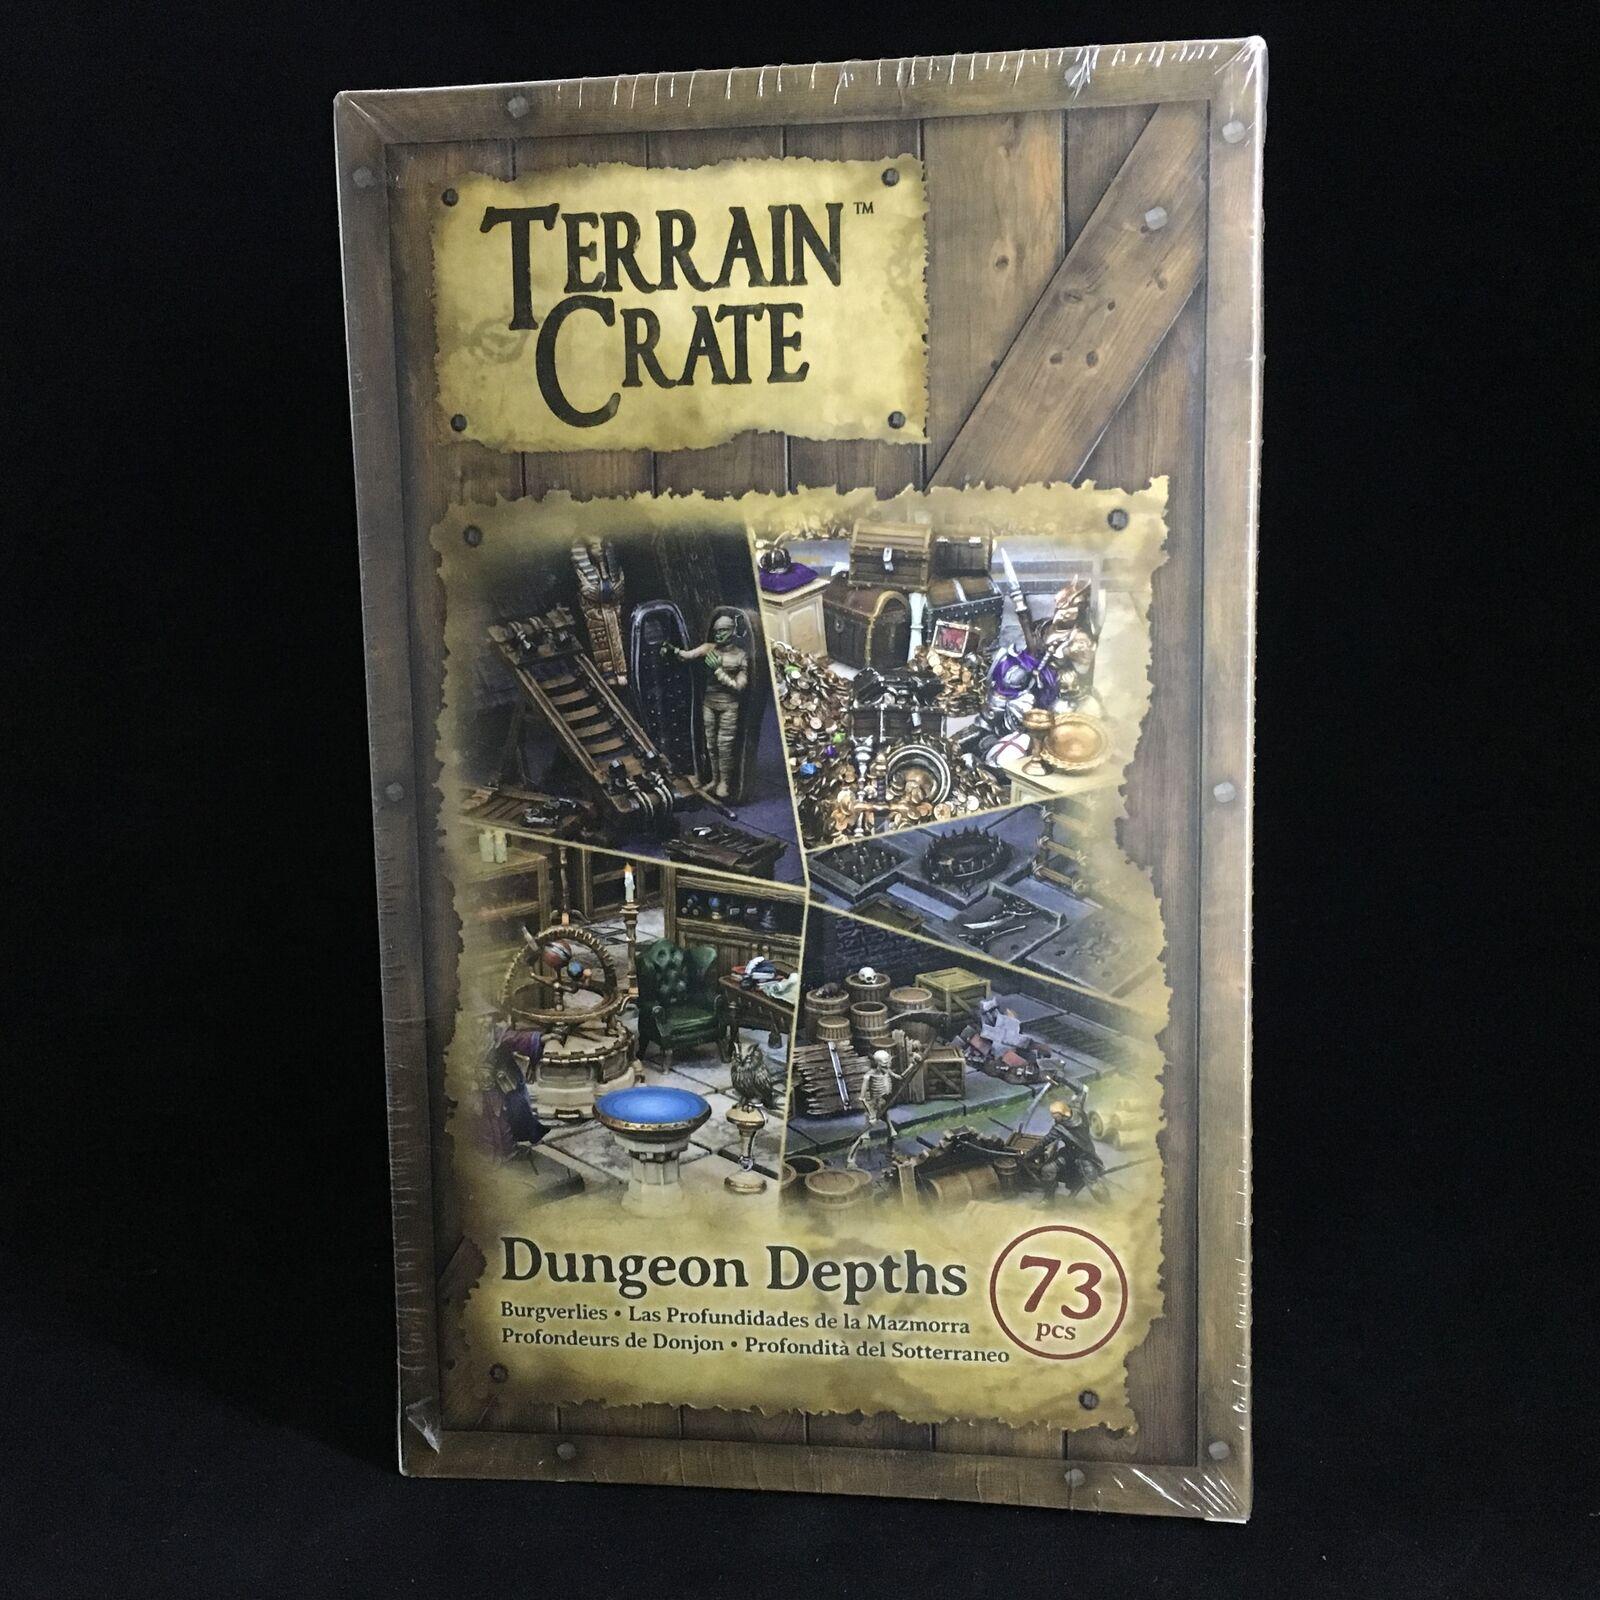 TERRAIN CRATE  Dungeon Depths - Mantic Games